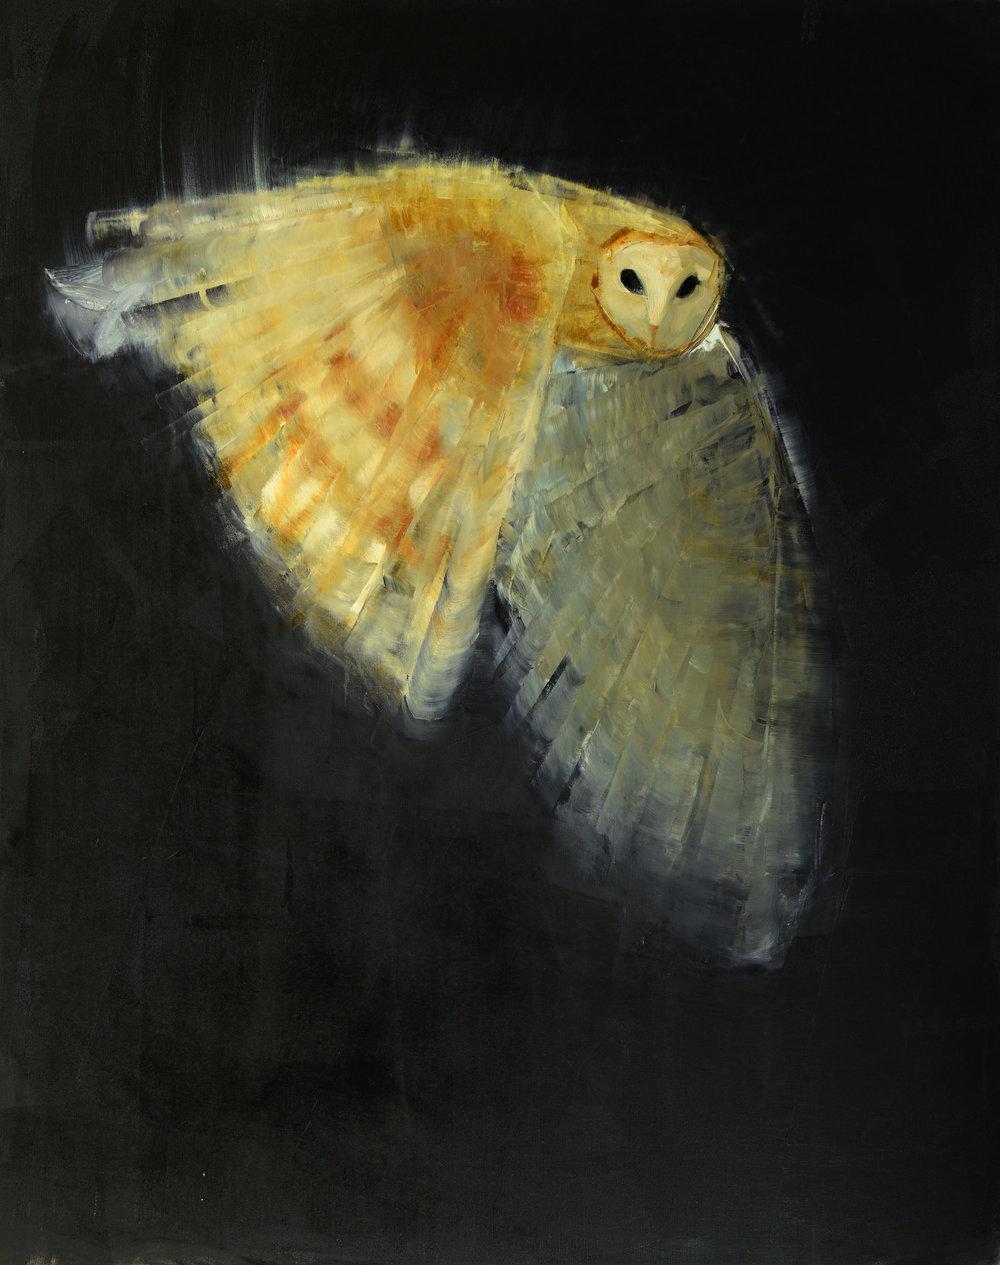 Barn+Owl+(Hunting)_60x48.jpg